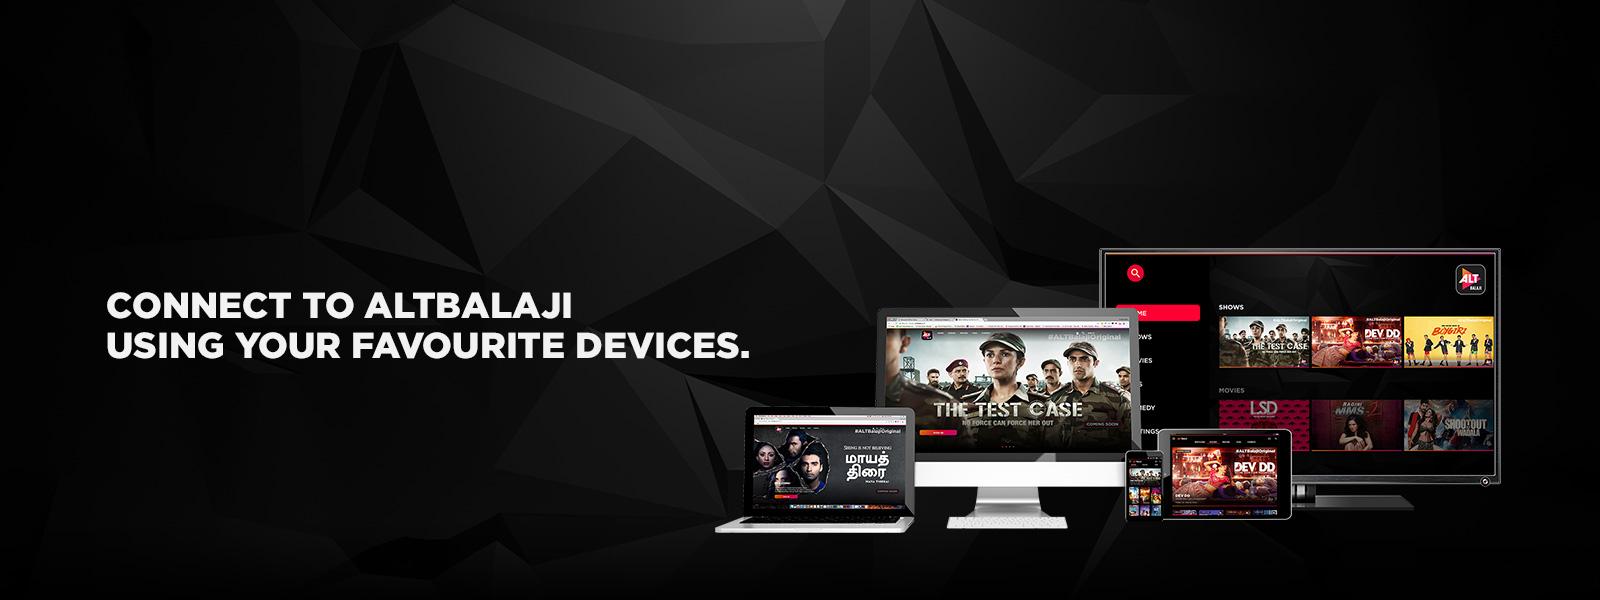 ALTBalaji Devices